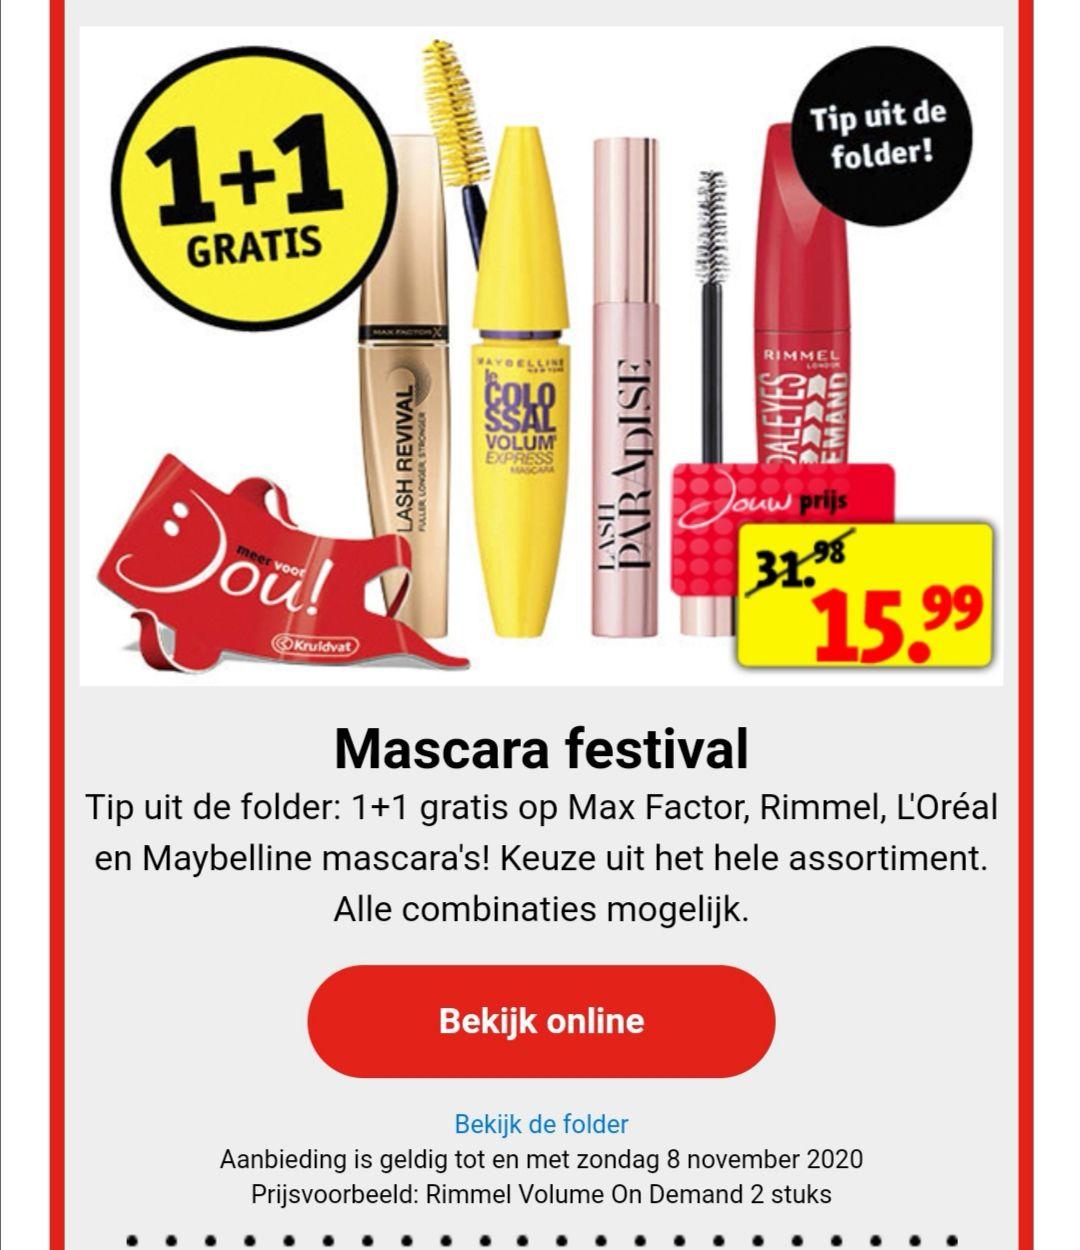 Mascara 1+1 gratis @Kruidvat